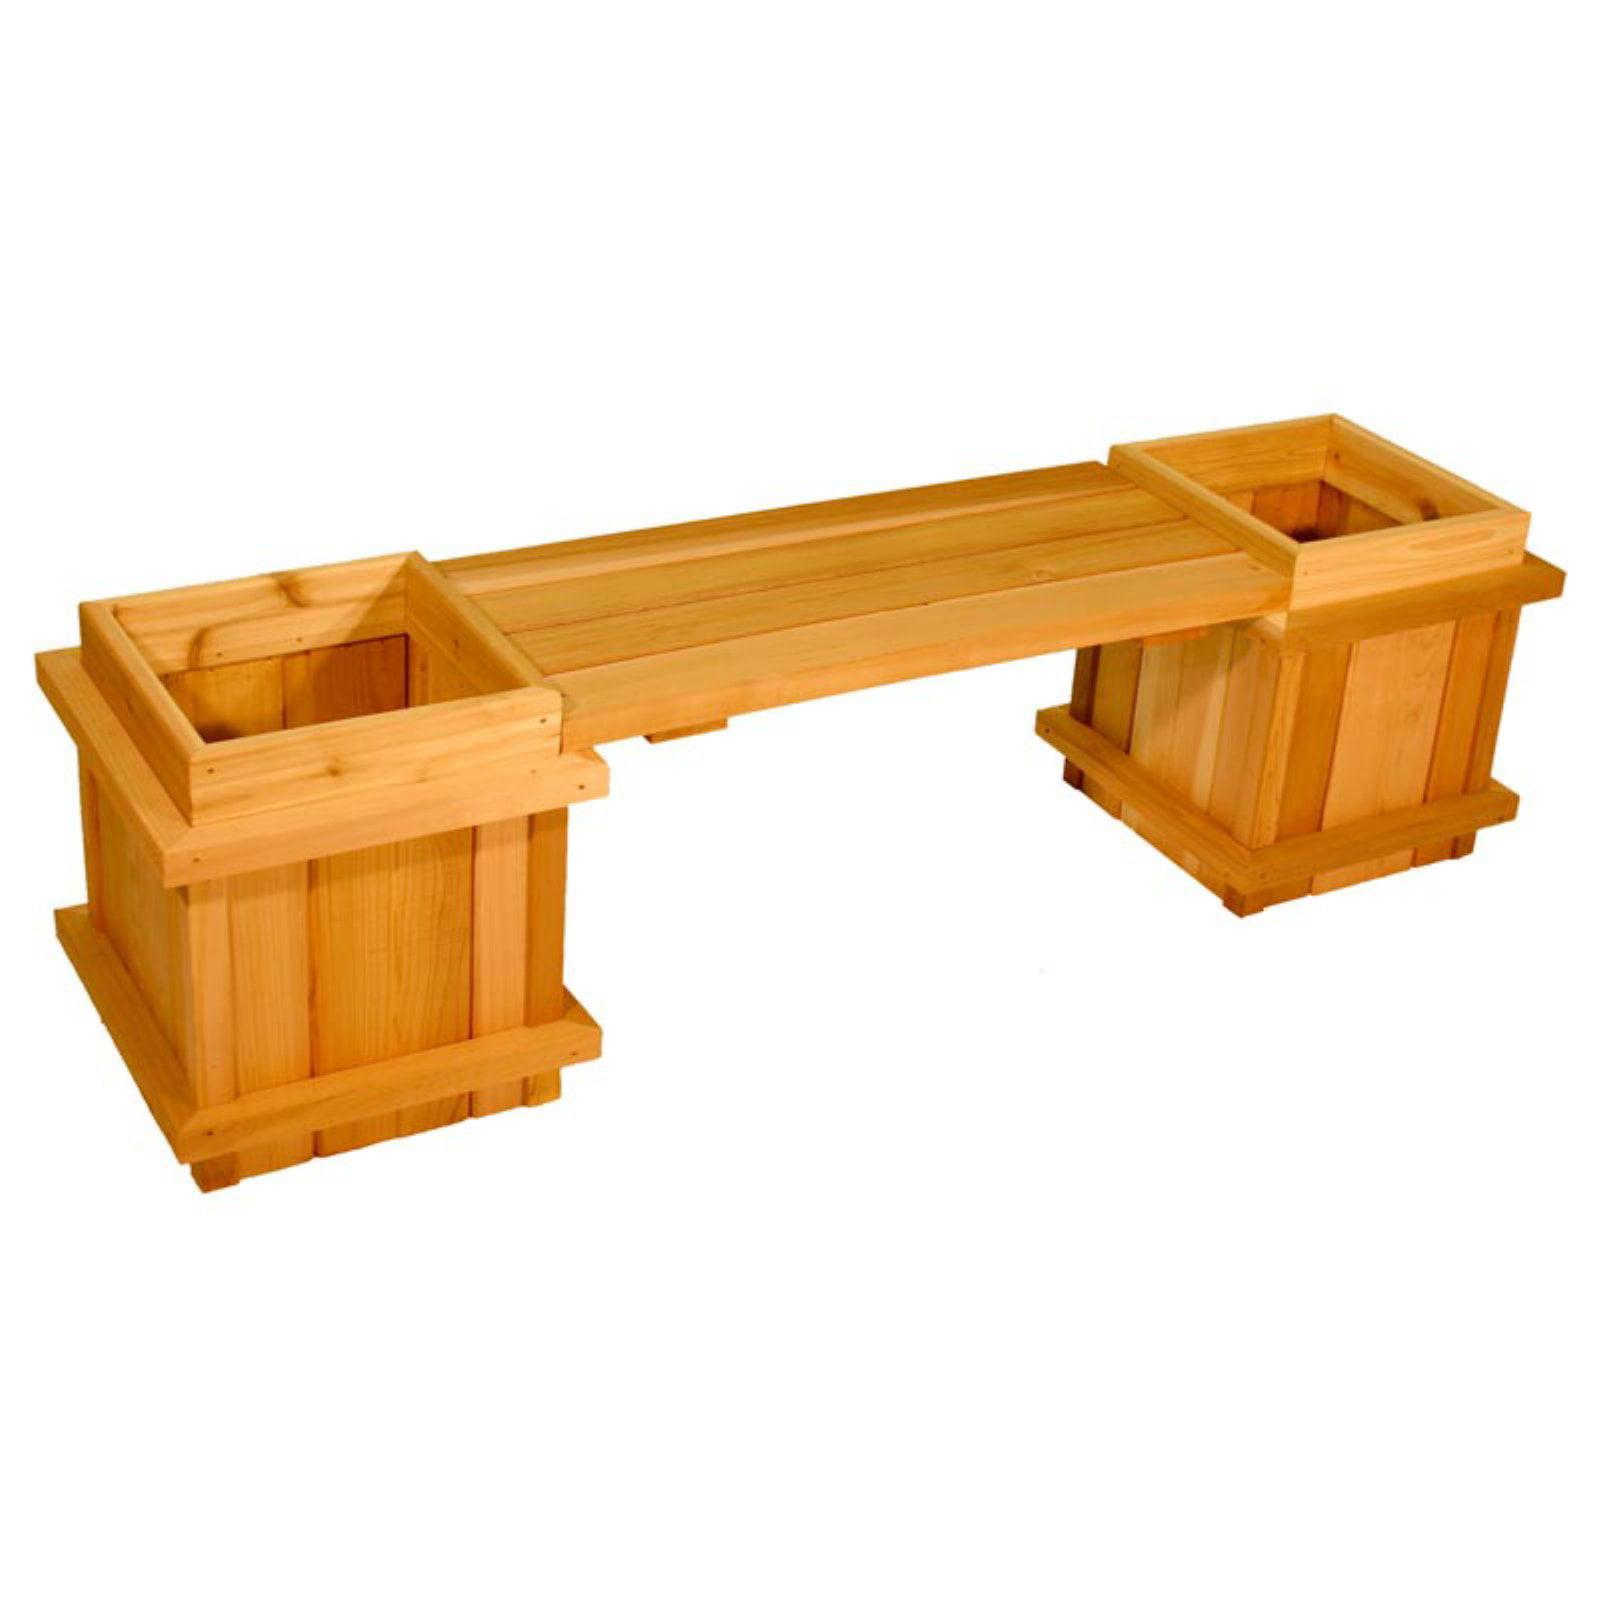 Aquila Square Cedar Wood 3-Piece Planter Bench Set by Aquila Cedar Products Ltd